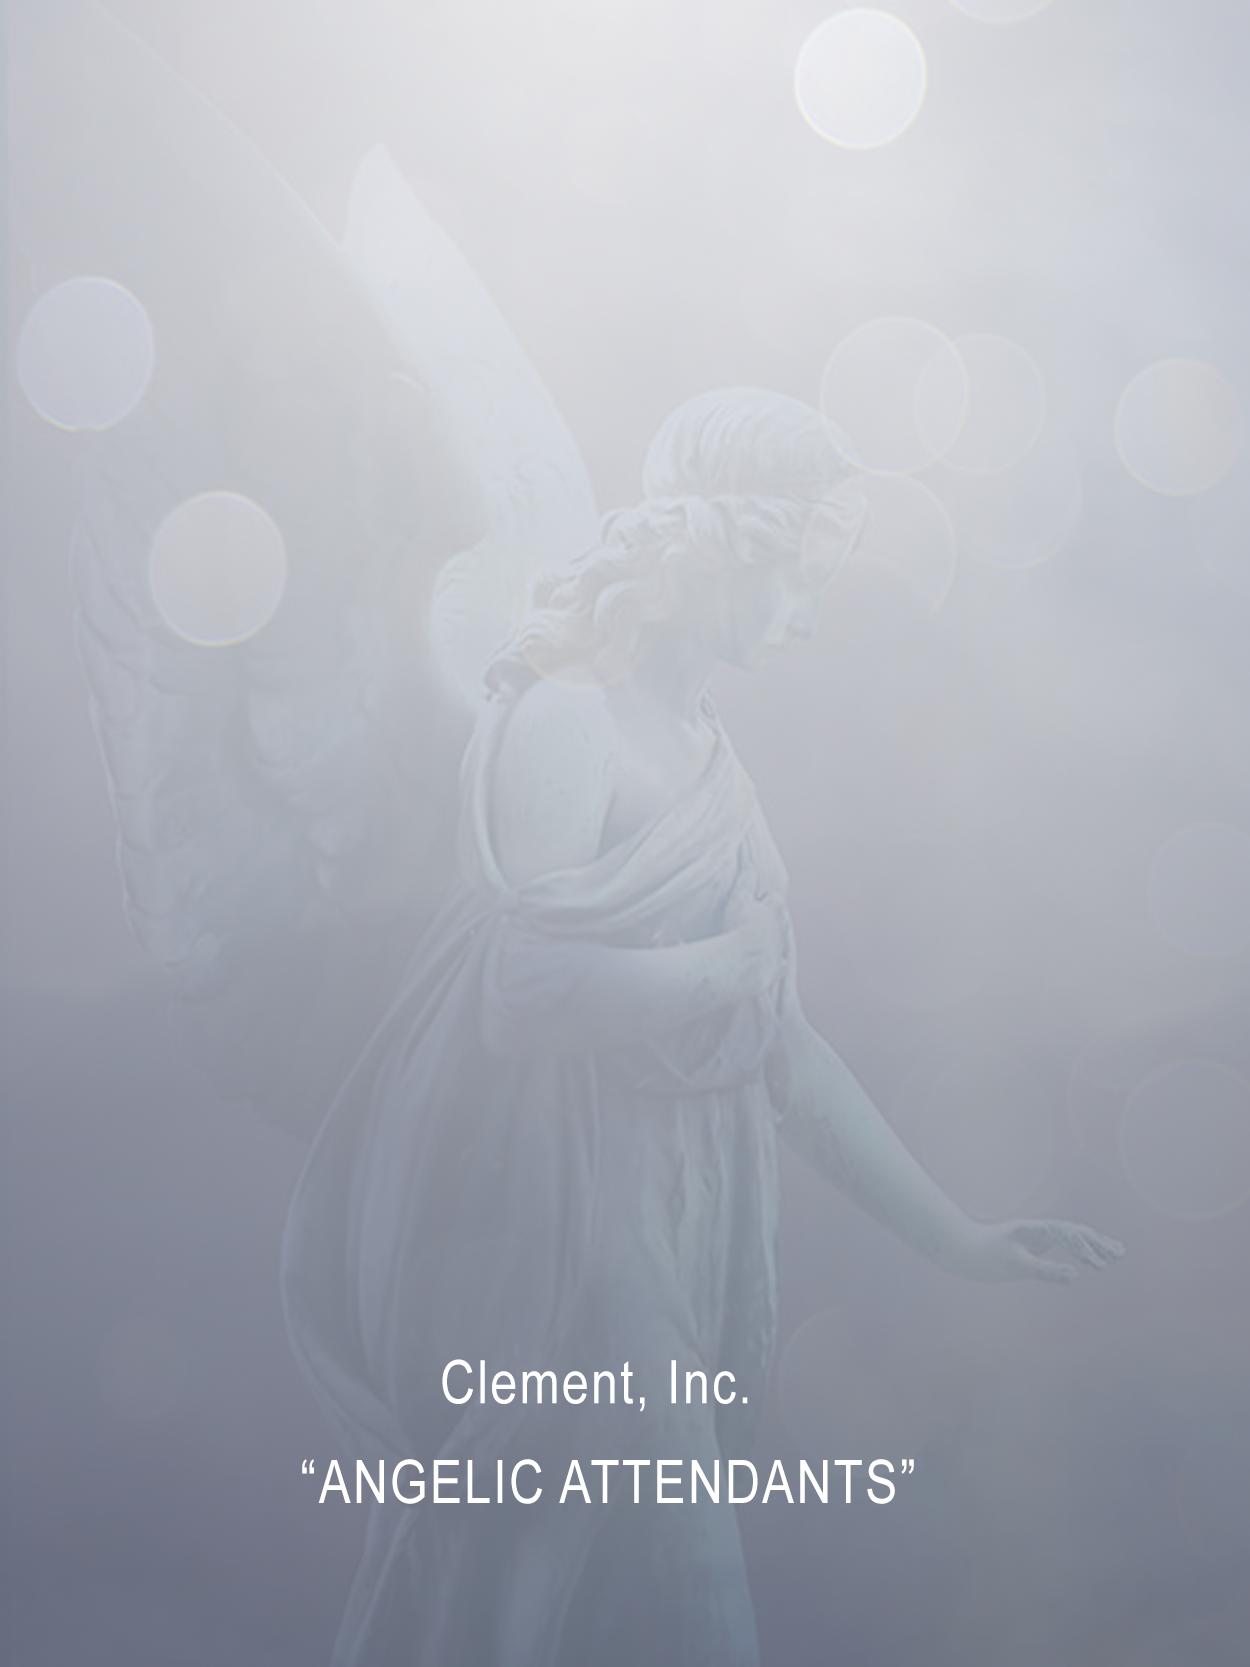 Angelic Attendants Alexa Skill